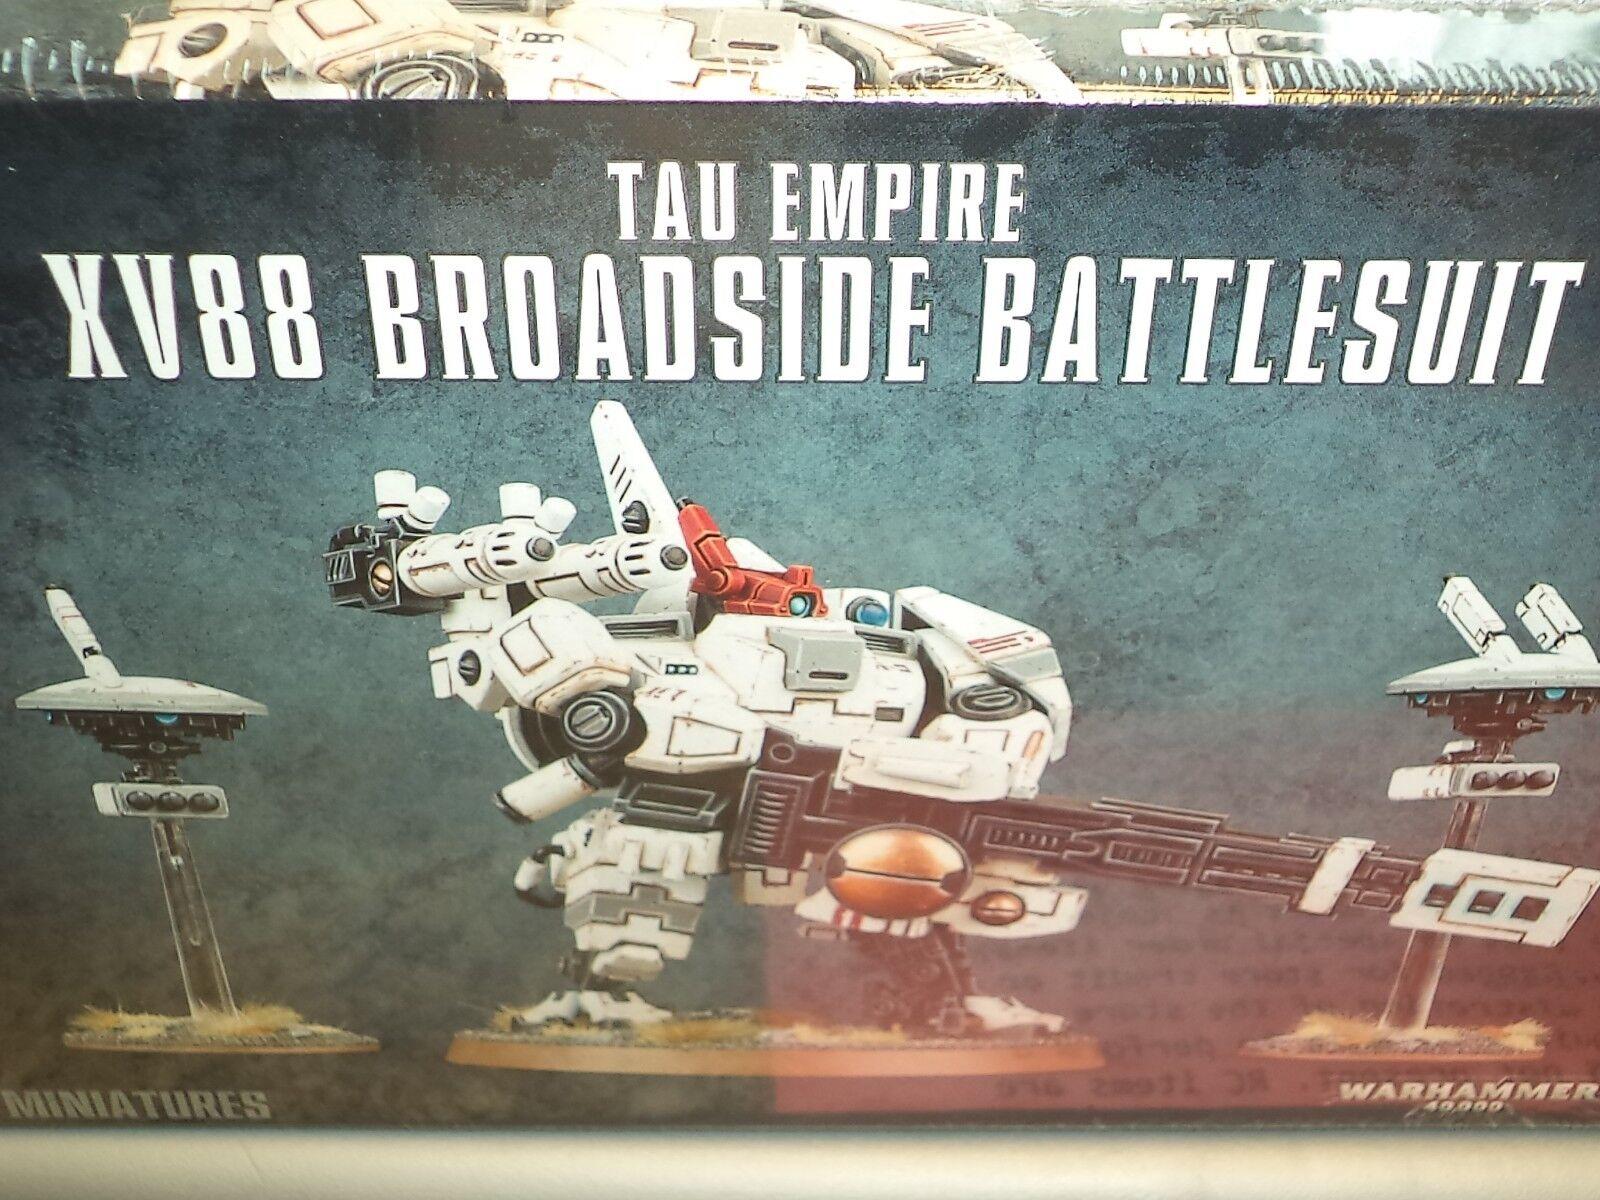 Battlesuit warhammer 40k tau - imperium xv88 brroadside 40.000 game workshop - modell